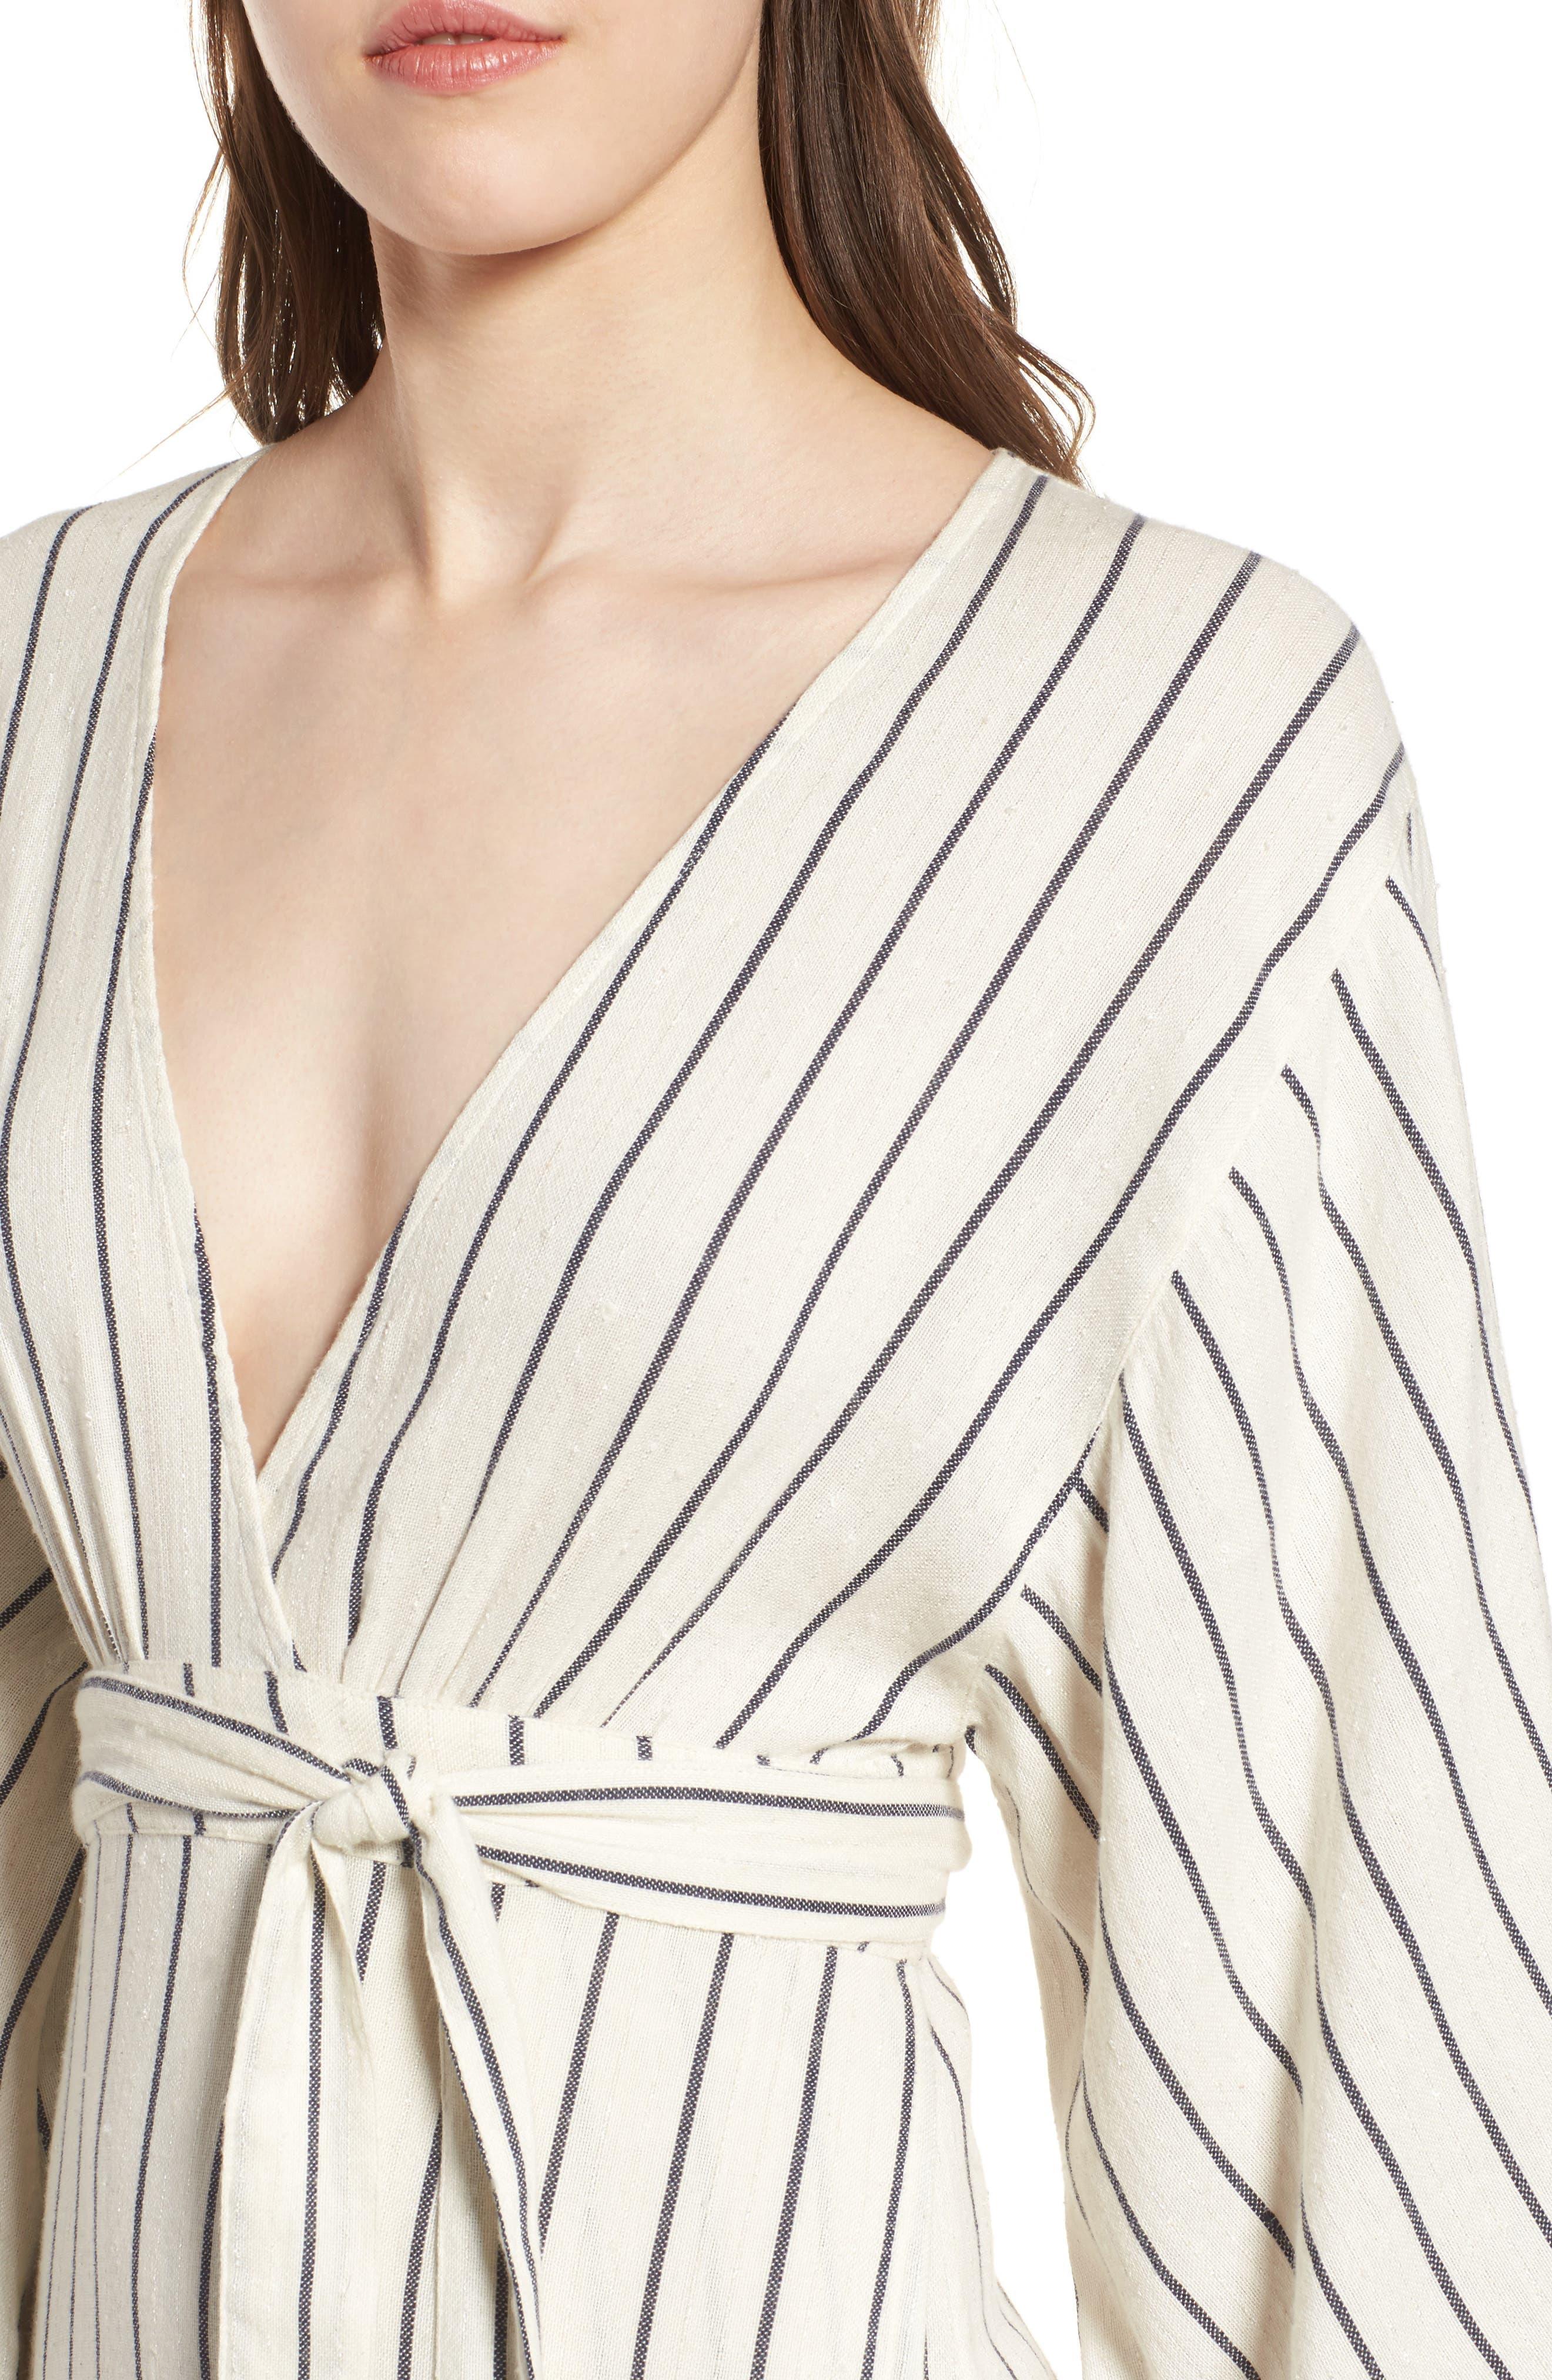 Robe Life Striped Midi Dress,                             Alternate thumbnail 4, color,                             Cool Wip